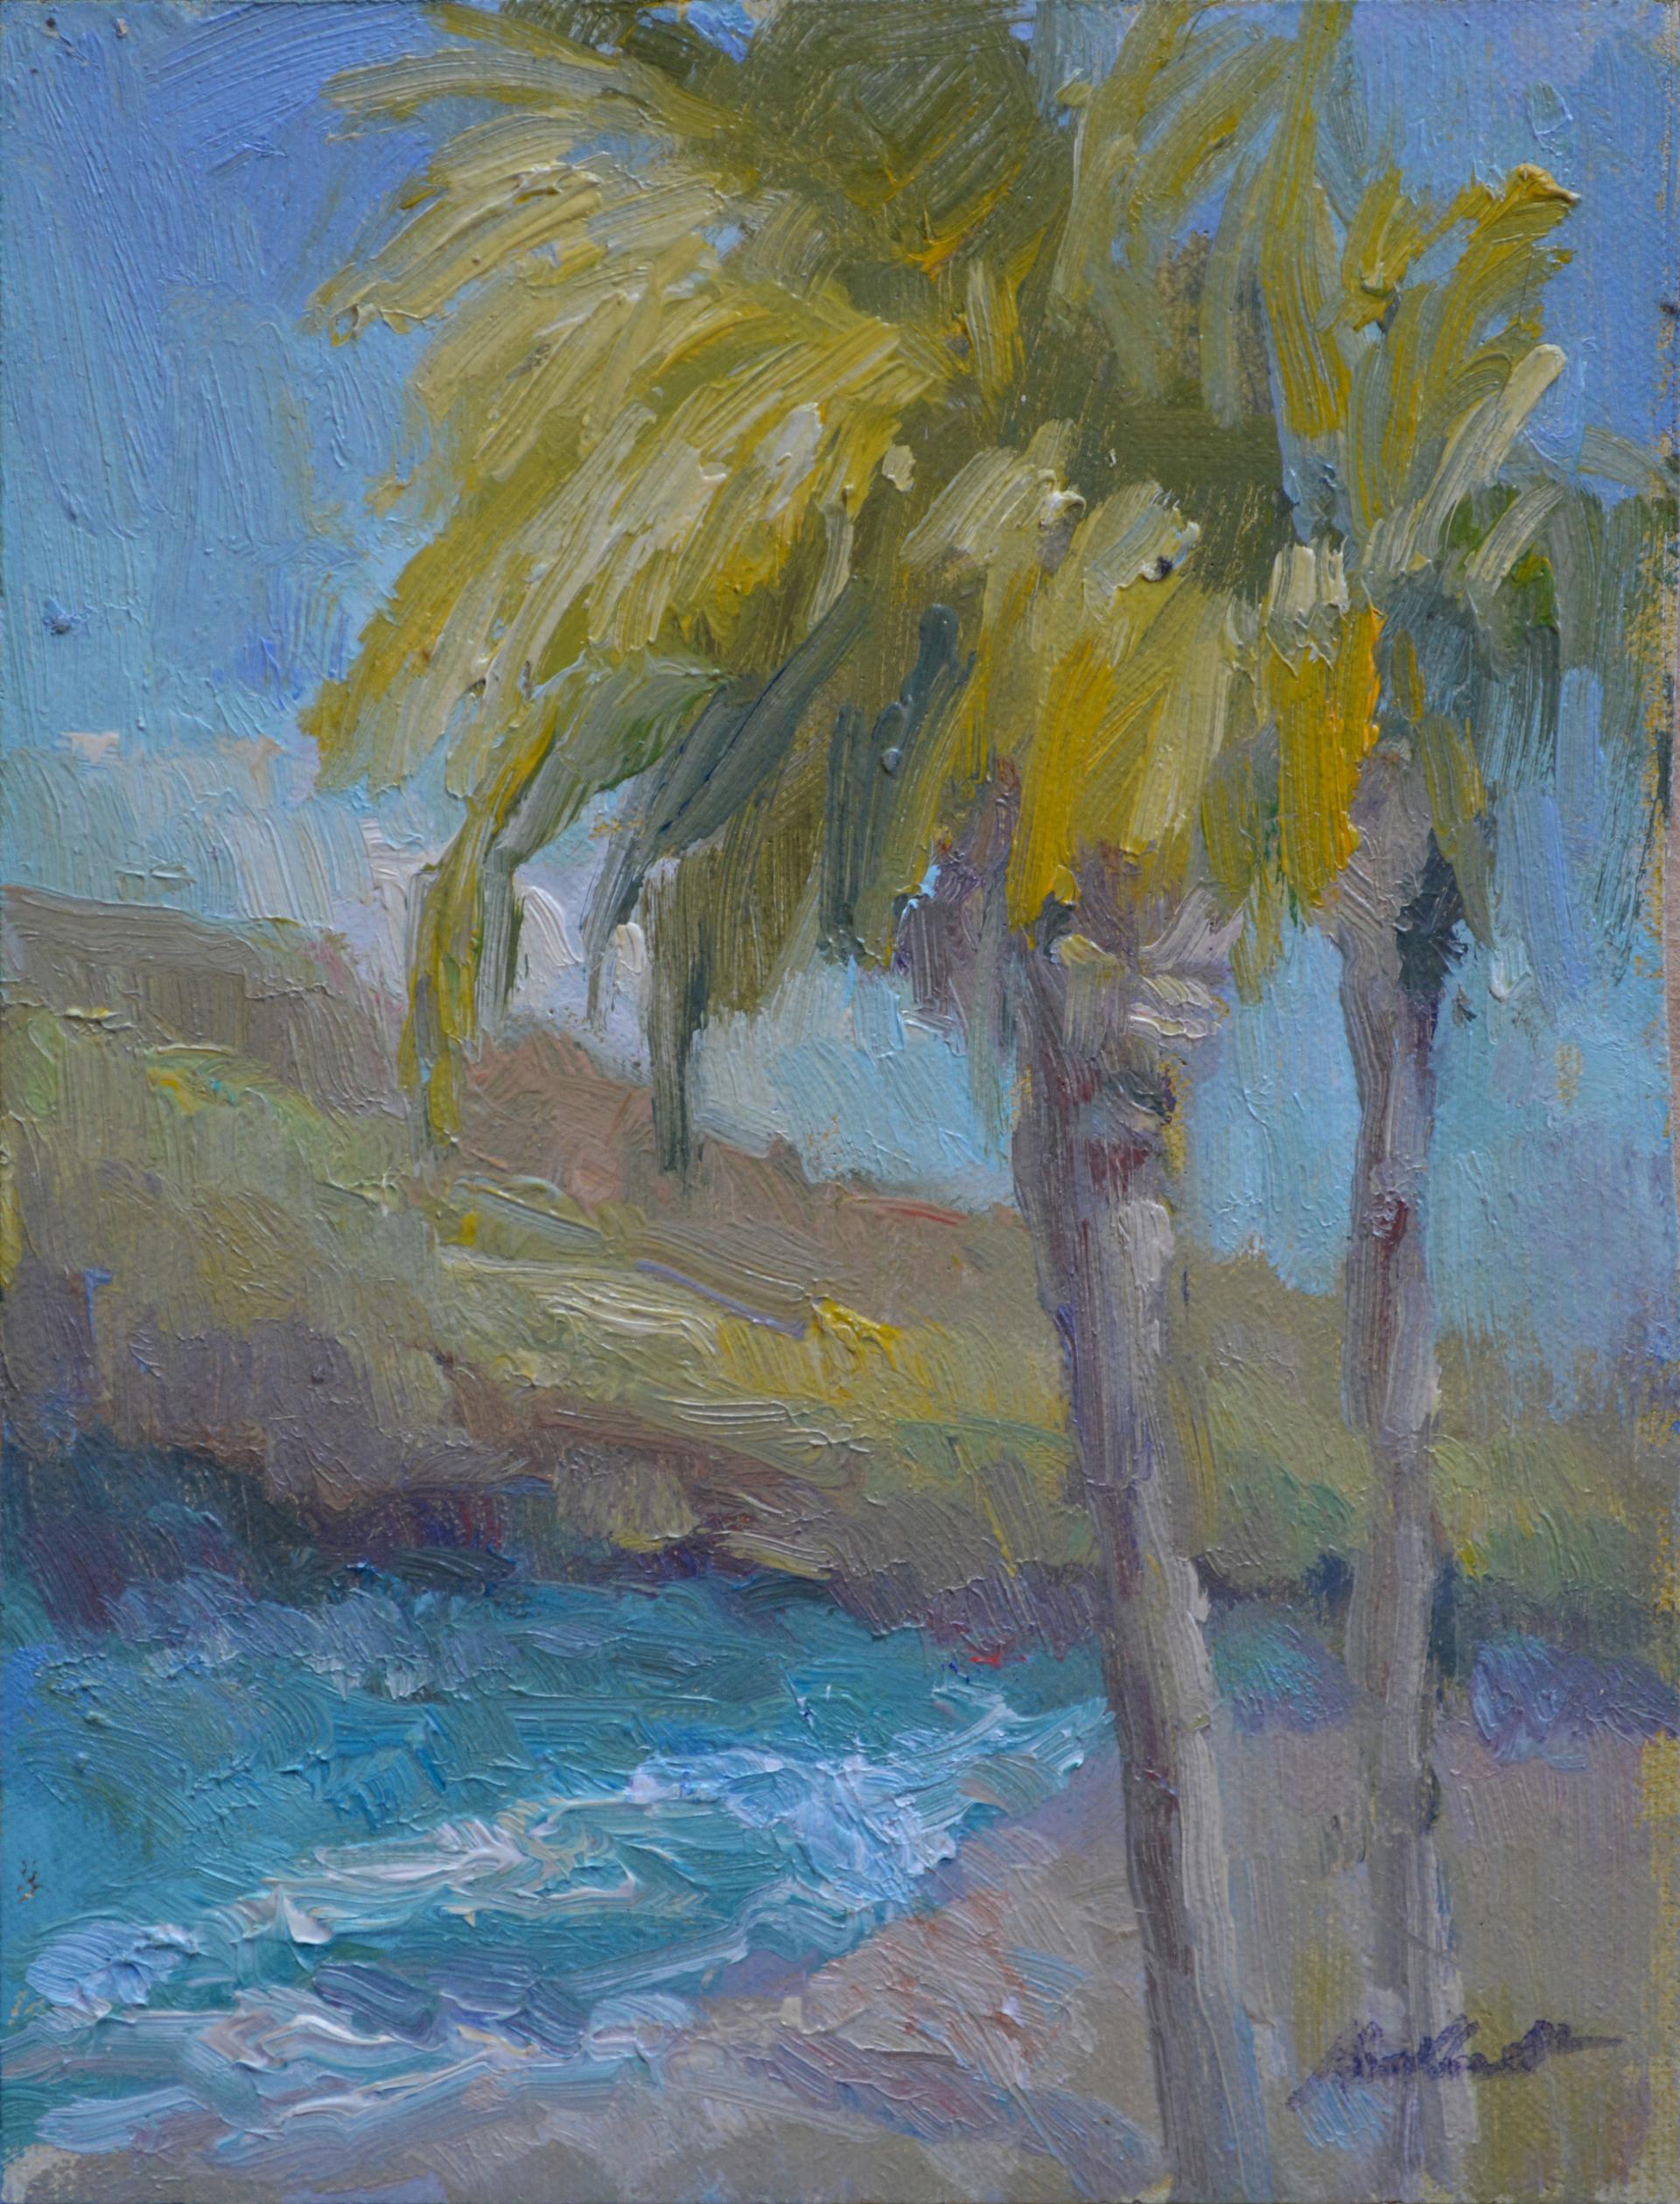 St. Croix Morning by Karen Hewitt Hagan